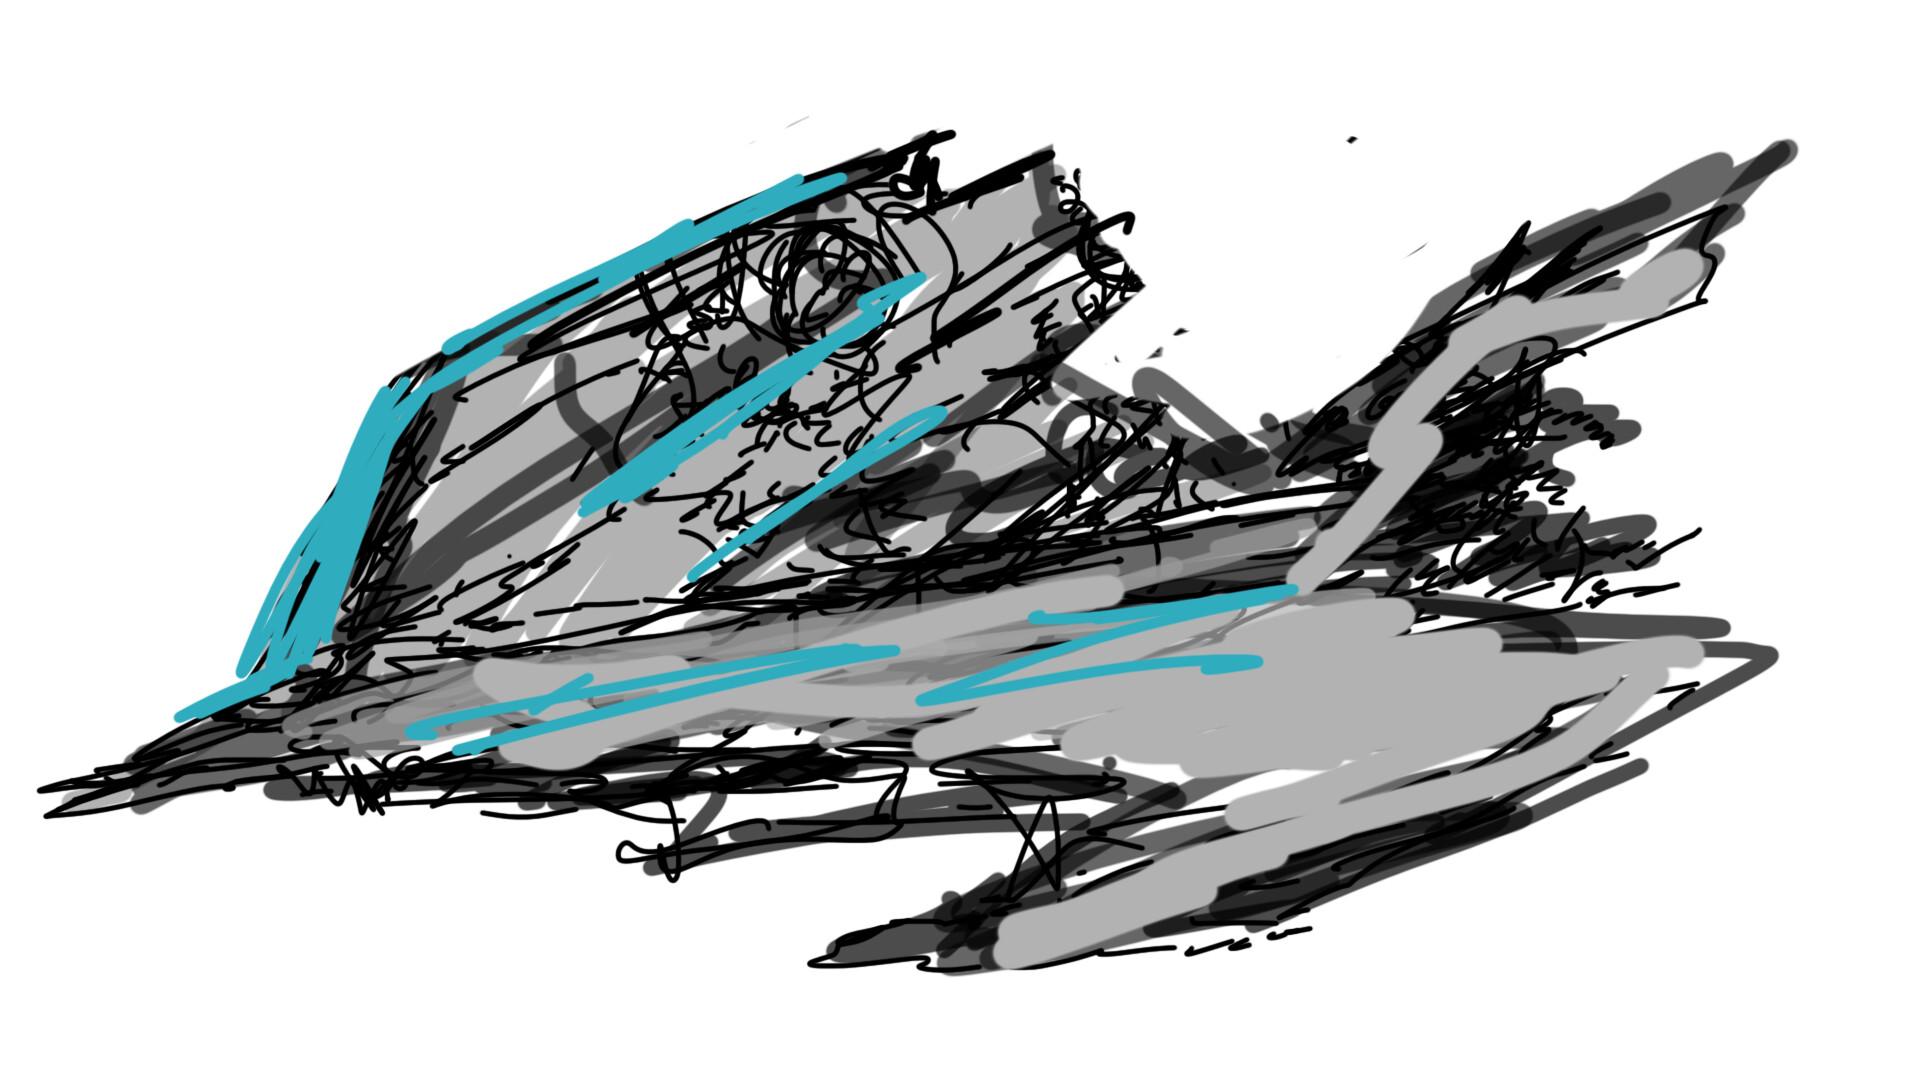 Alexander laheij ship sketch